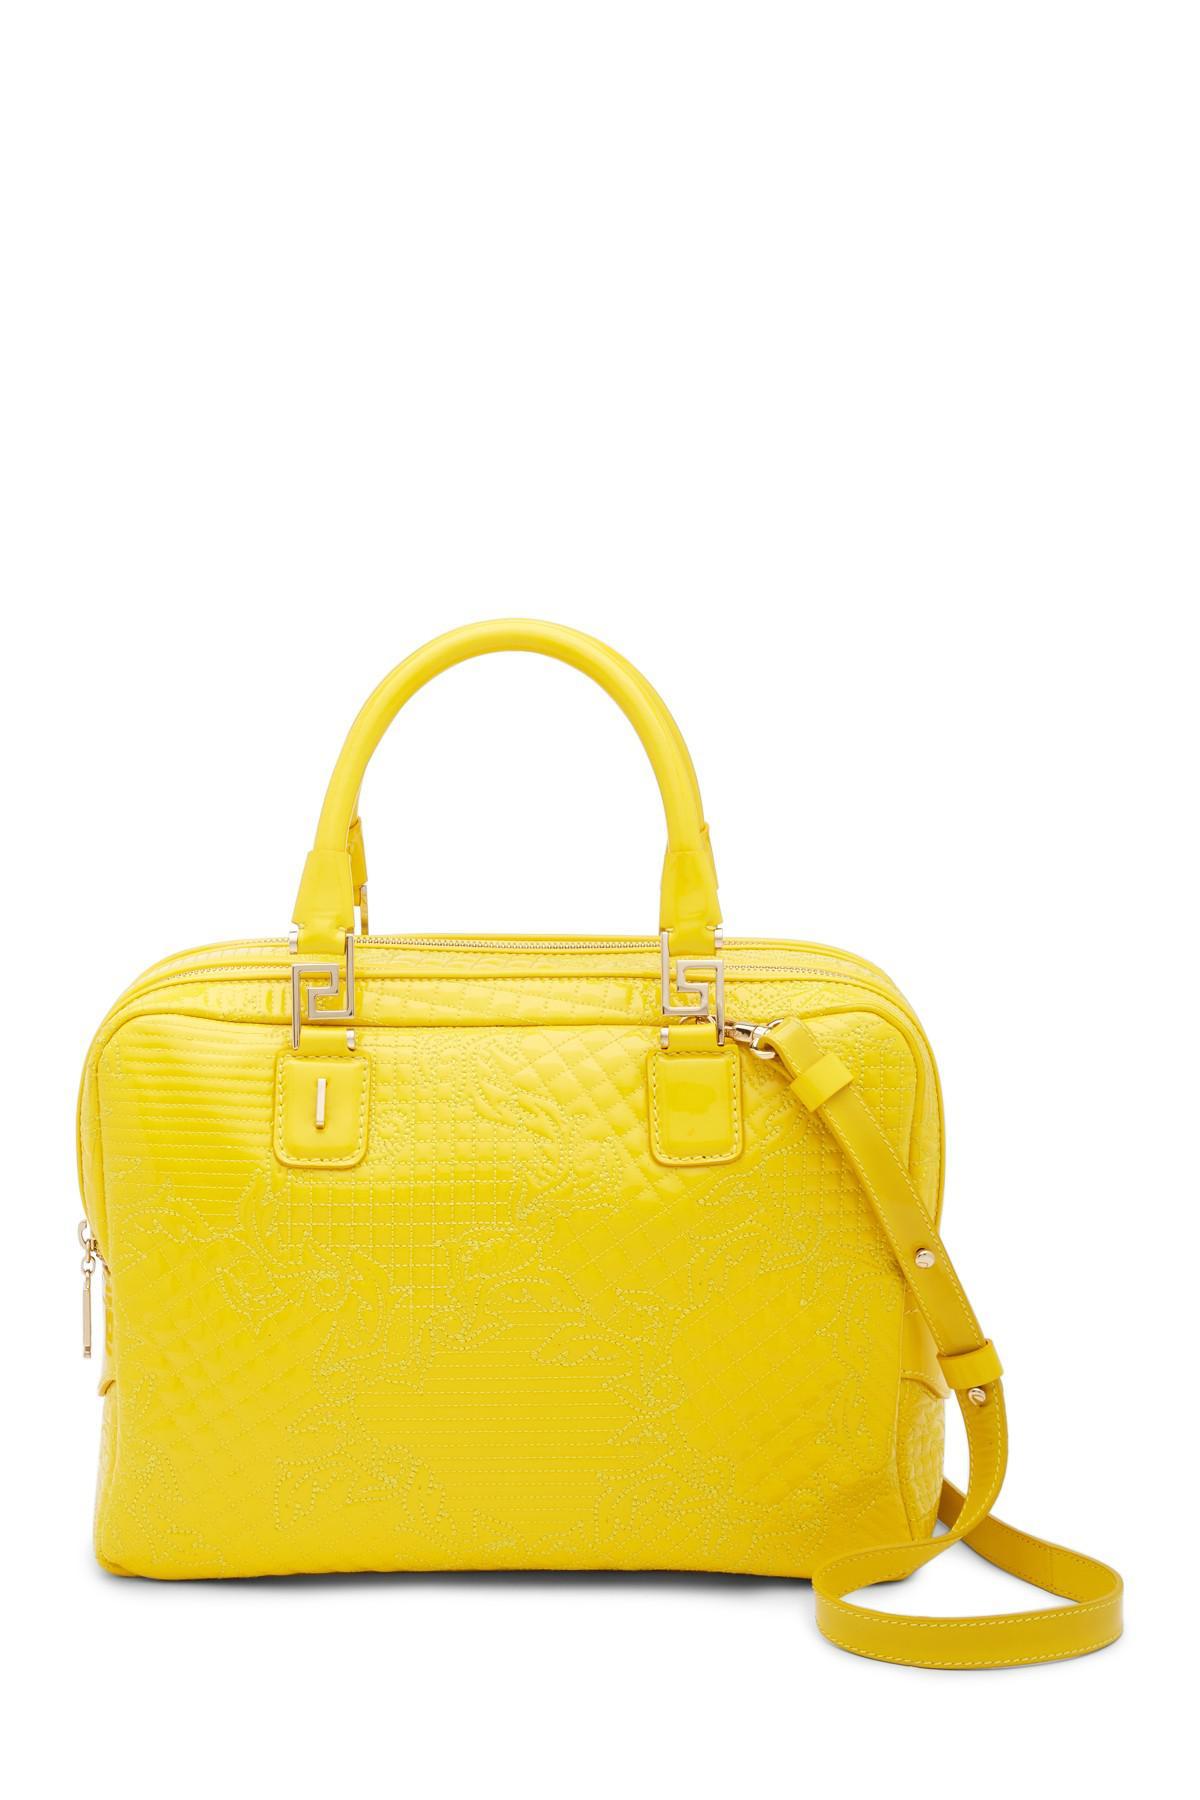 ab0d70c8aaf Versace Borsa Vernice Ricamo Leather Shoulder Bag in Yellow - Lyst